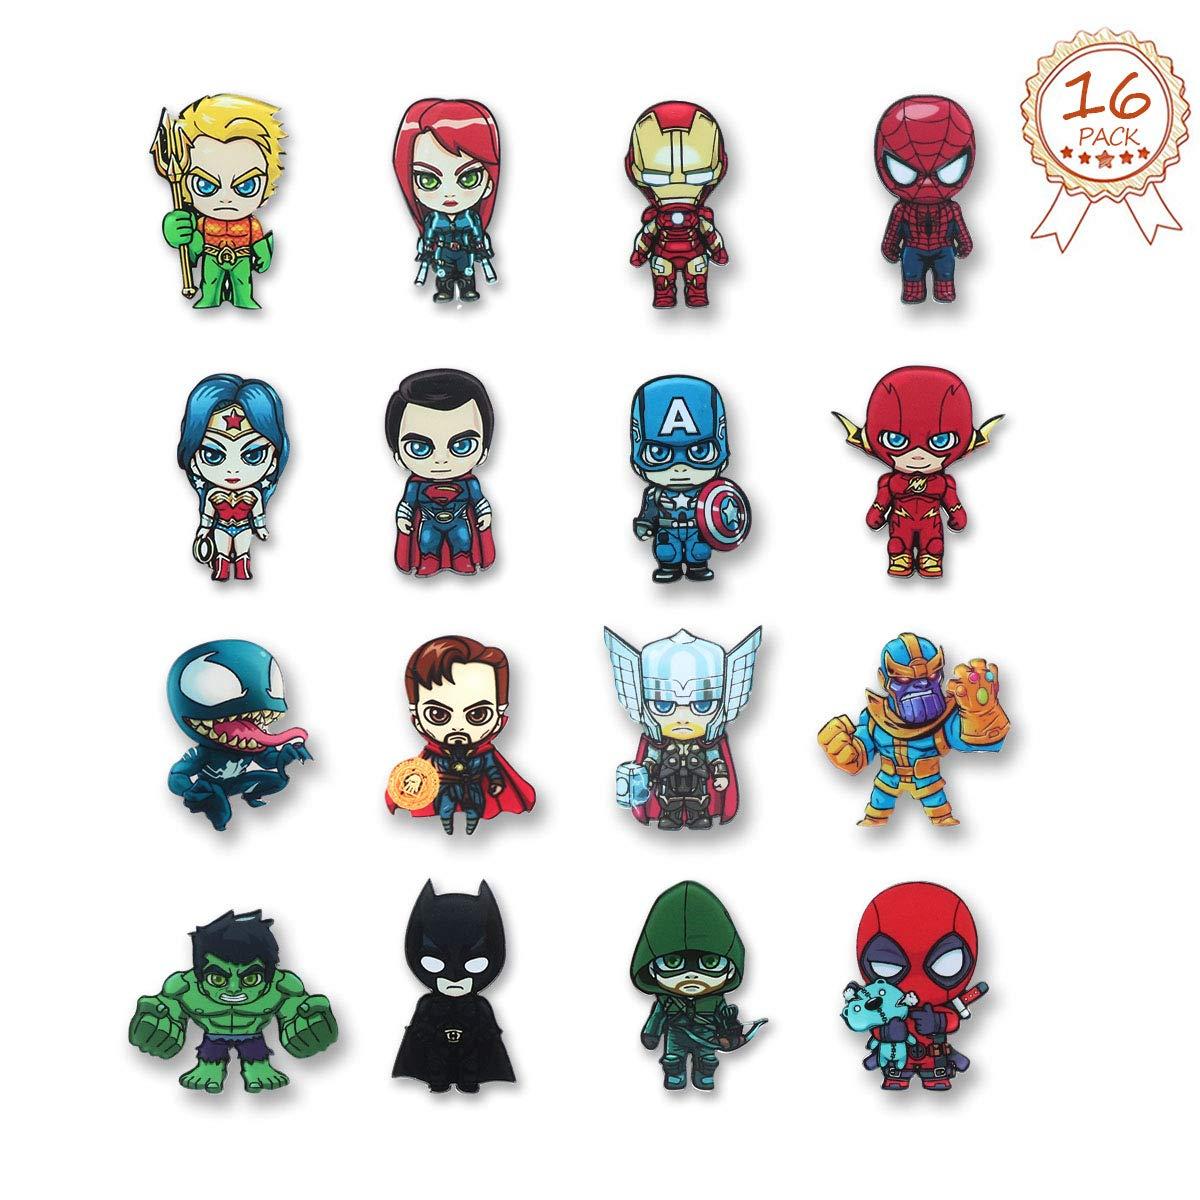 Comic Superhero Refrigerator Magnets HXDZFX Fridge Magnets Set of 16 Marvel The Avengers /& DC Justice League Characters Perfect Decorative Magnet